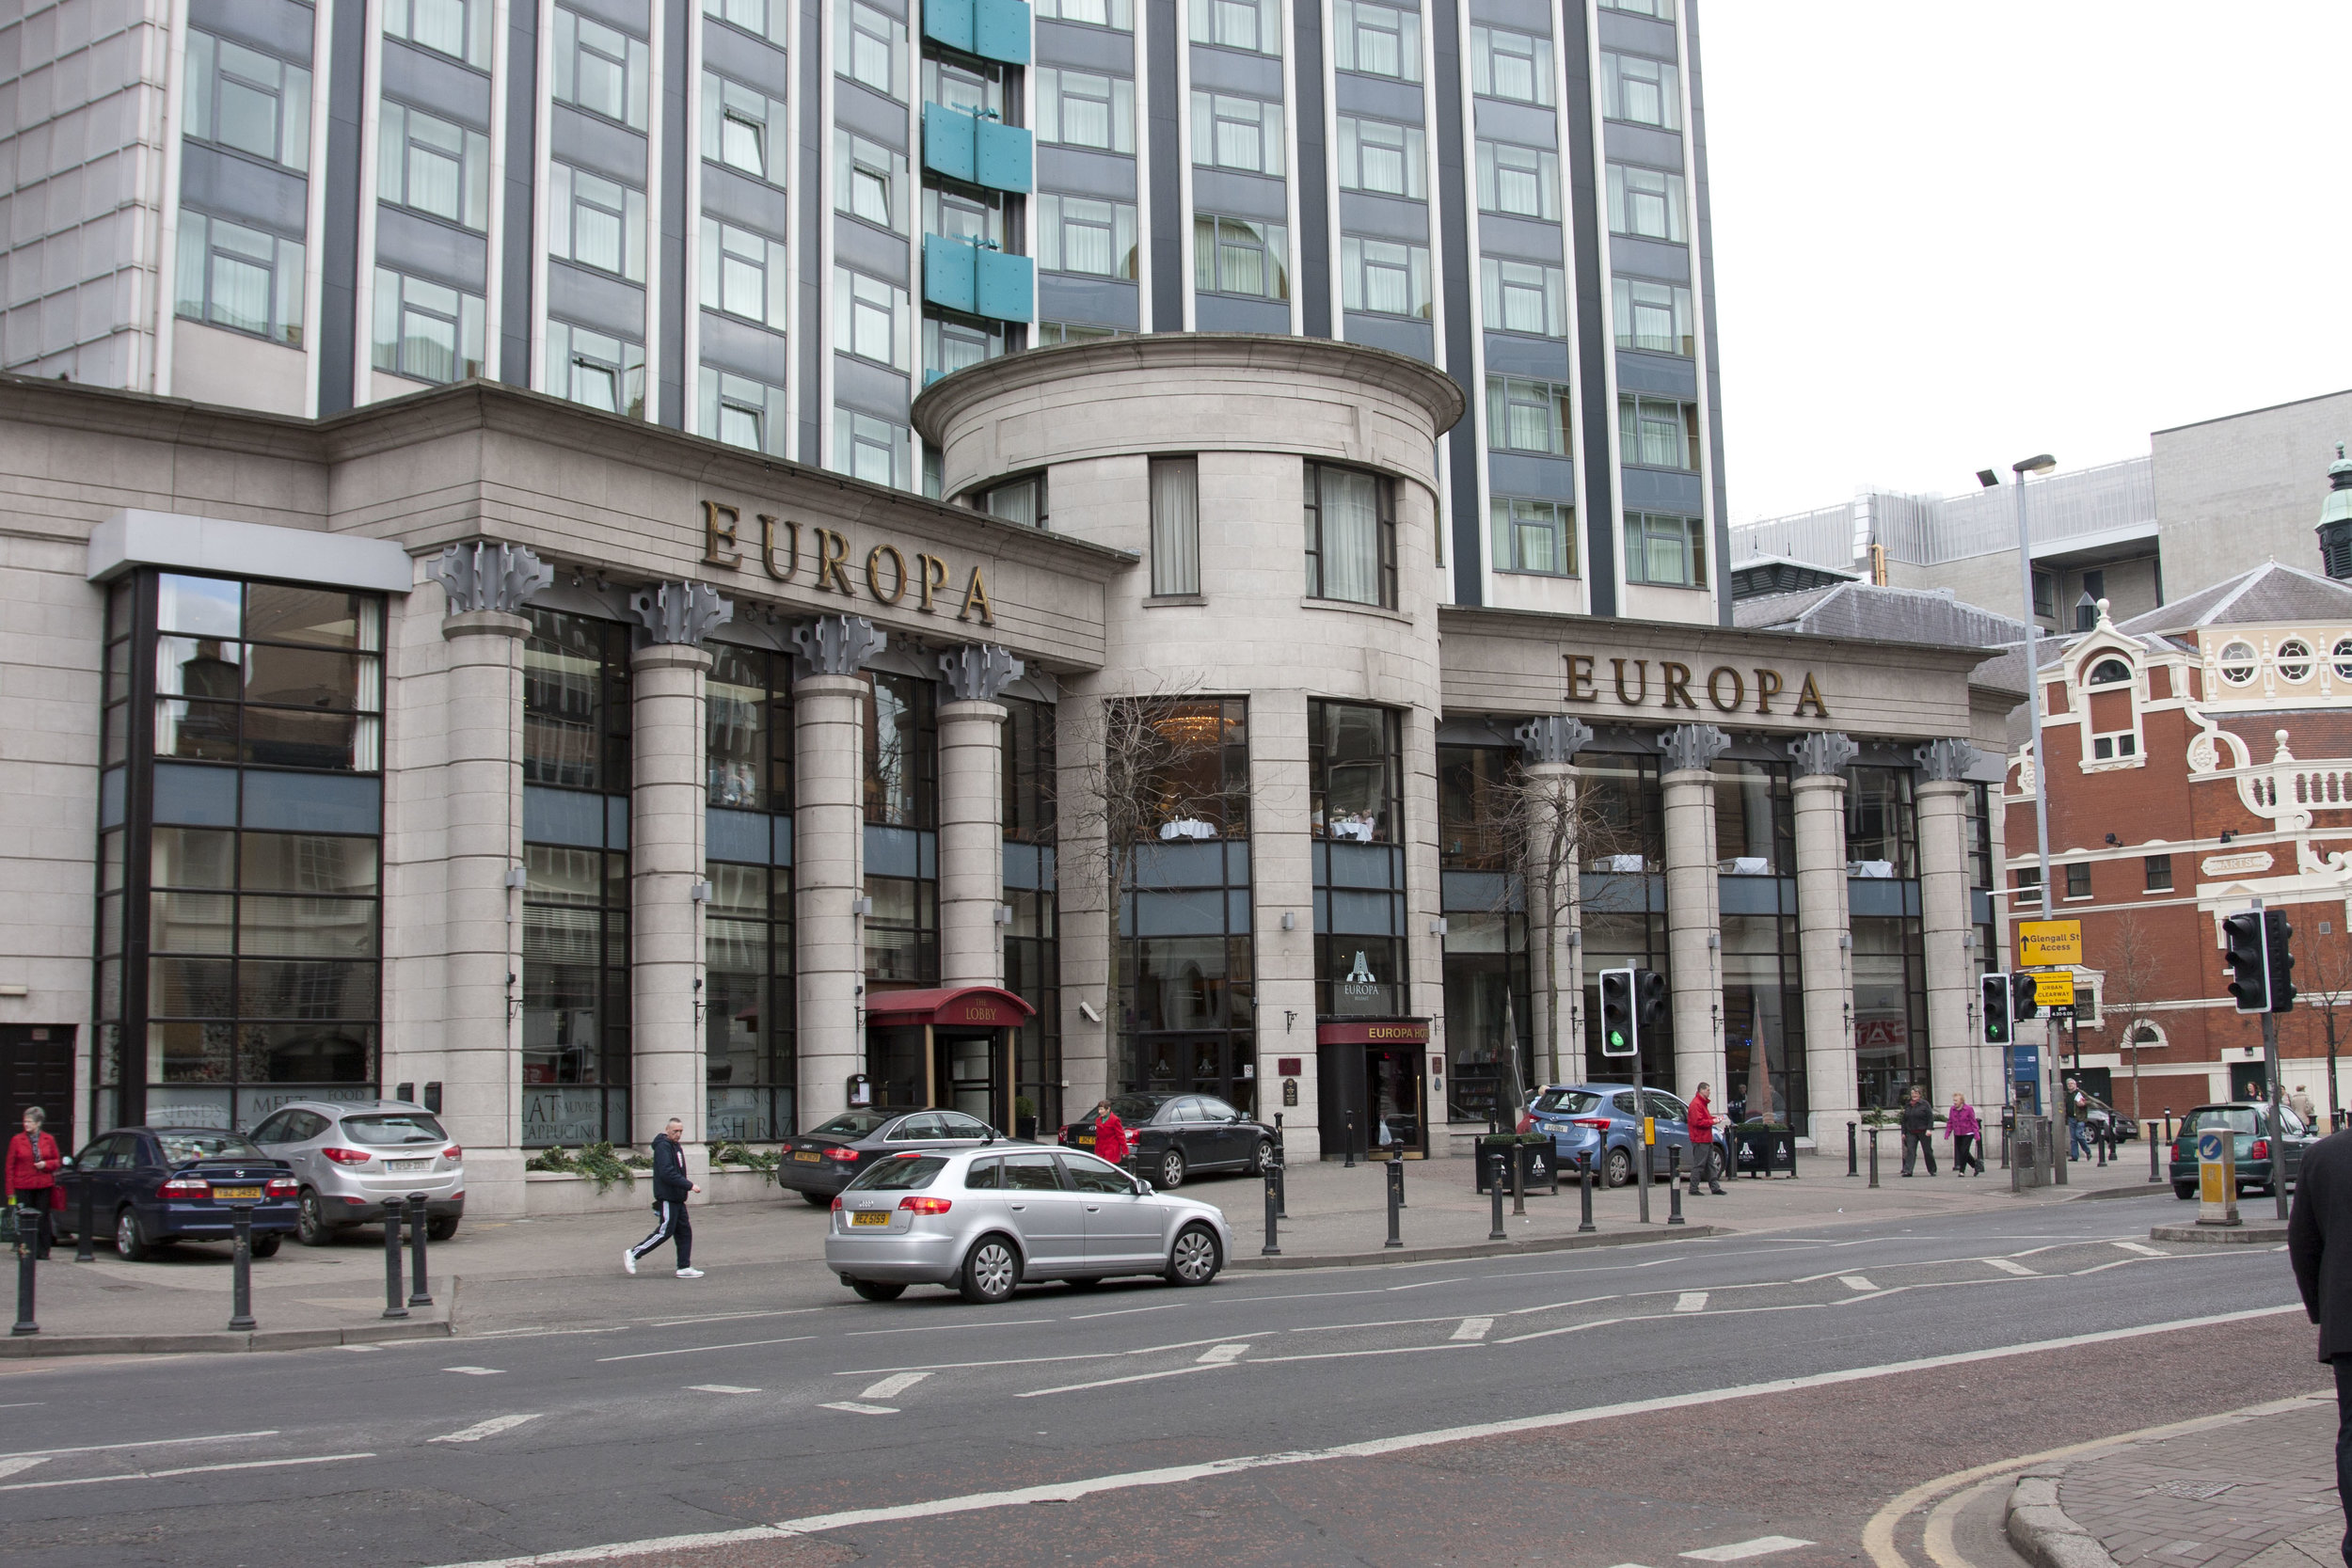 Exteriores del Hotel Europa de Belfast